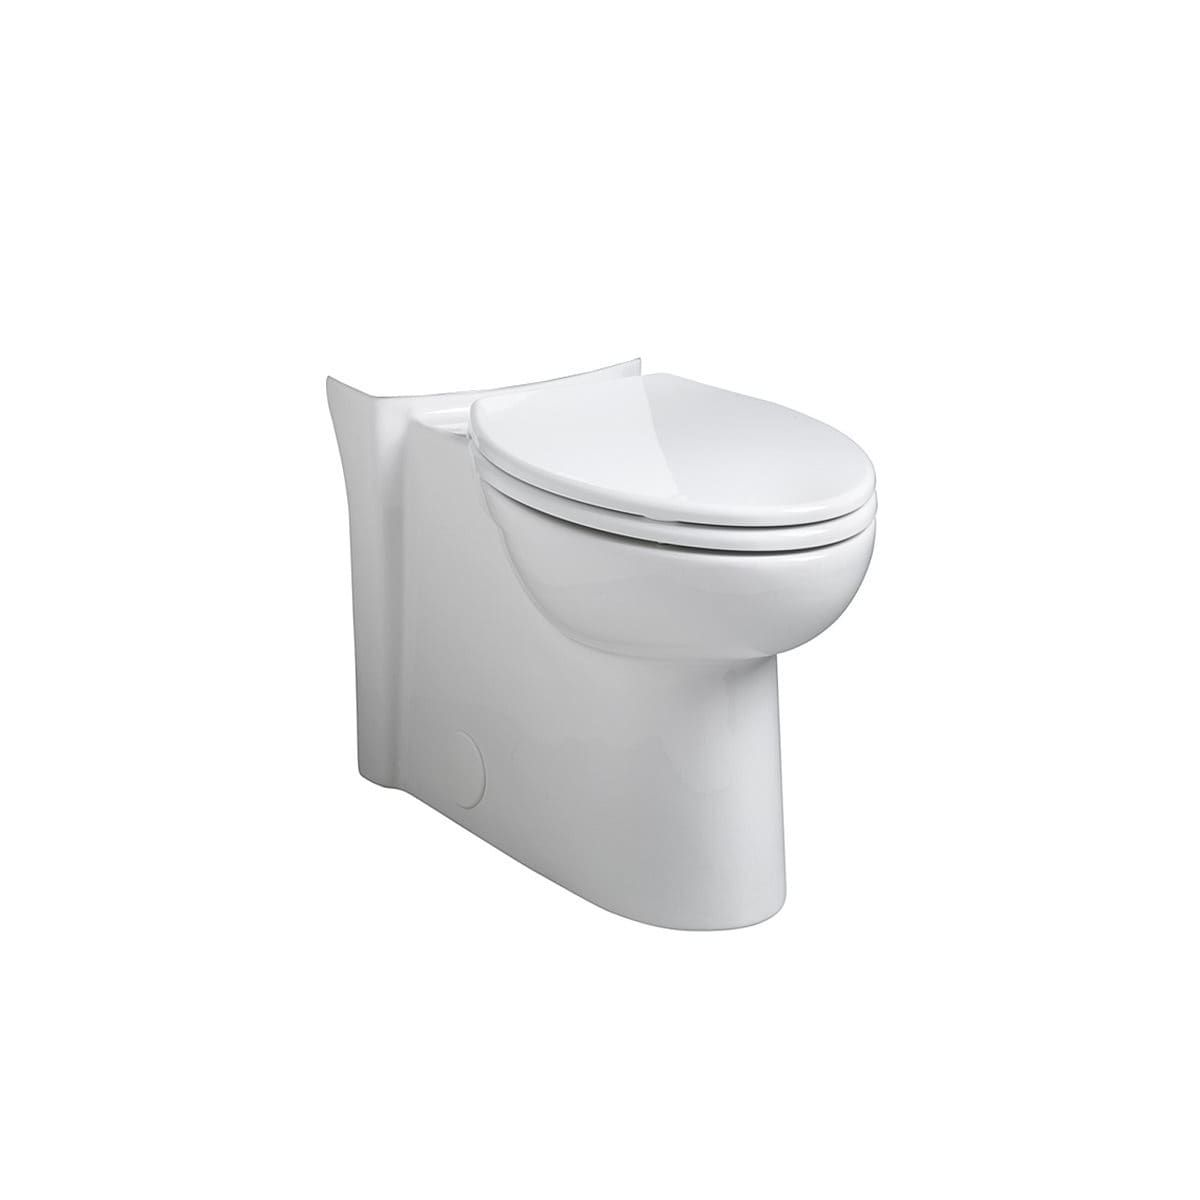 Admirable American Standard 3075 000 In 2019 Decor For 4 American Inzonedesignstudio Interior Chair Design Inzonedesignstudiocom